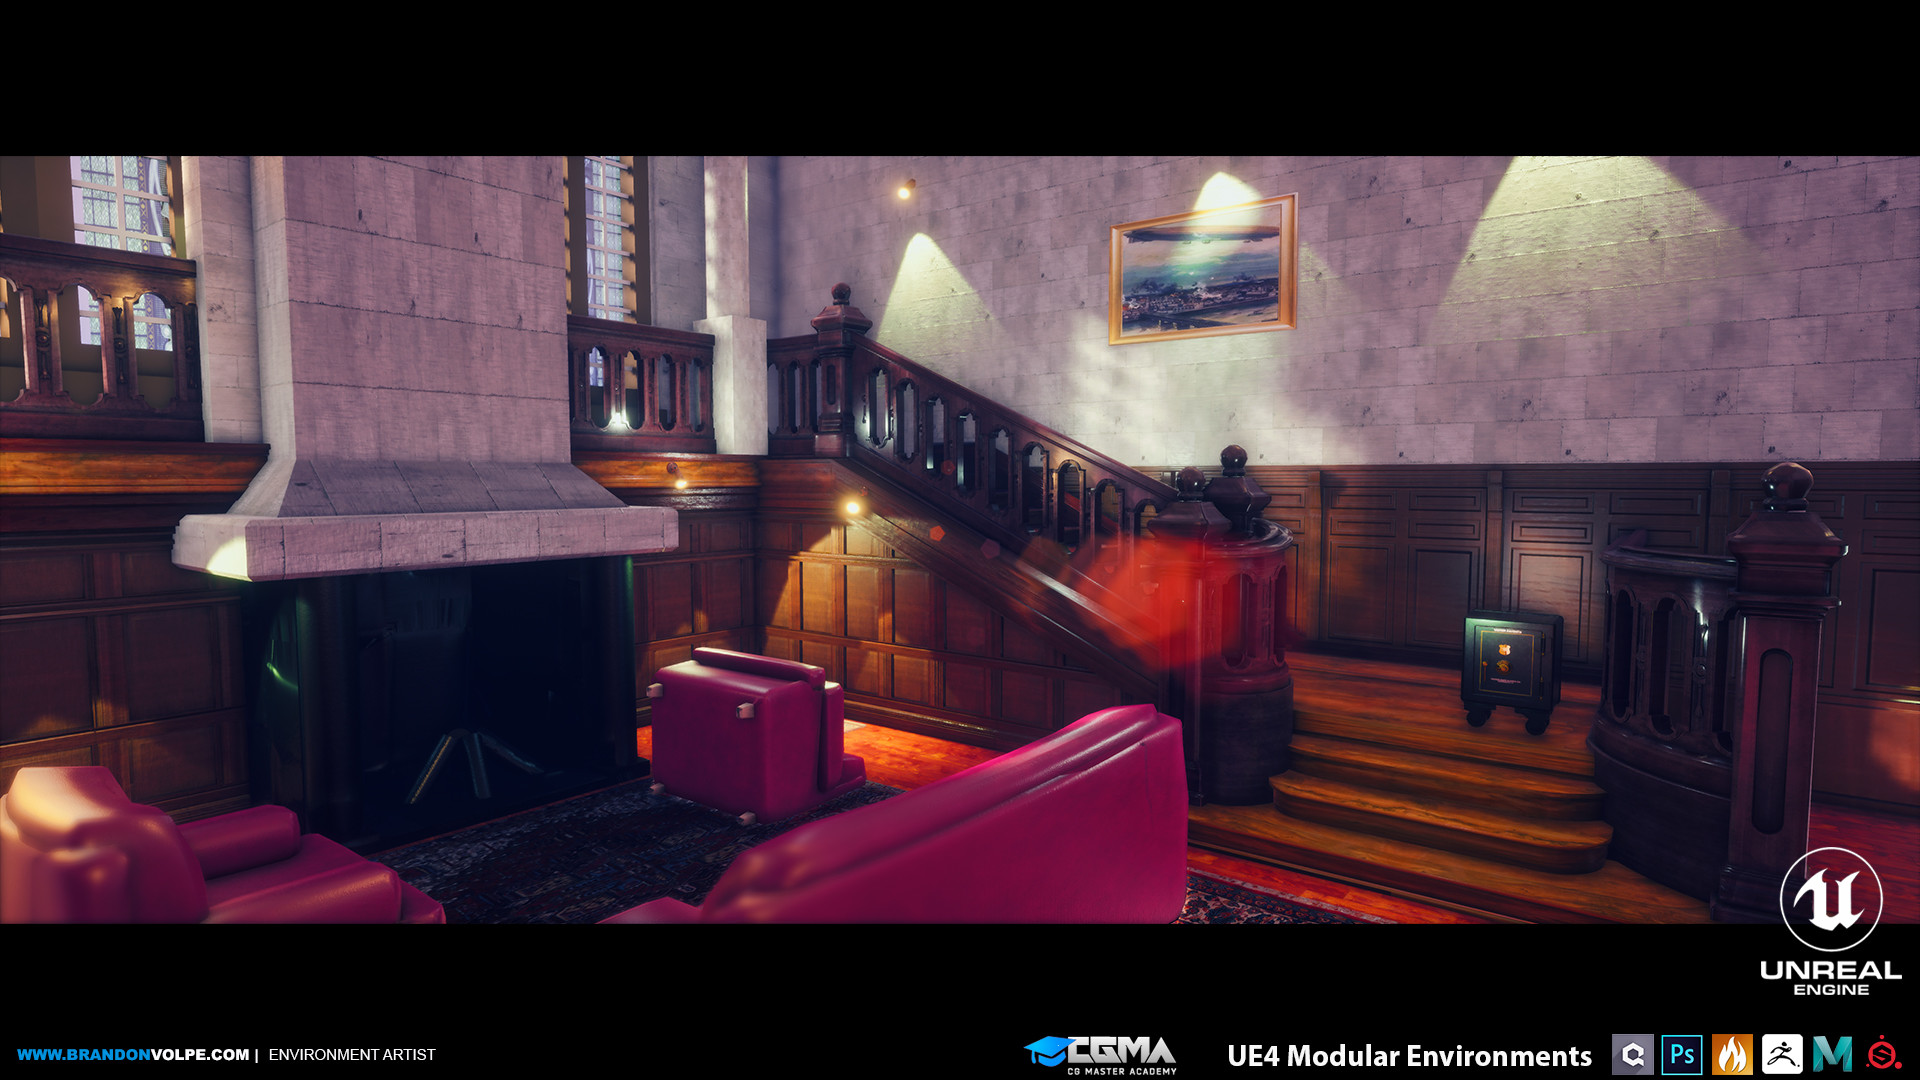 Brandon volpe brandonvolpe cgma modularenv mansion wip 011